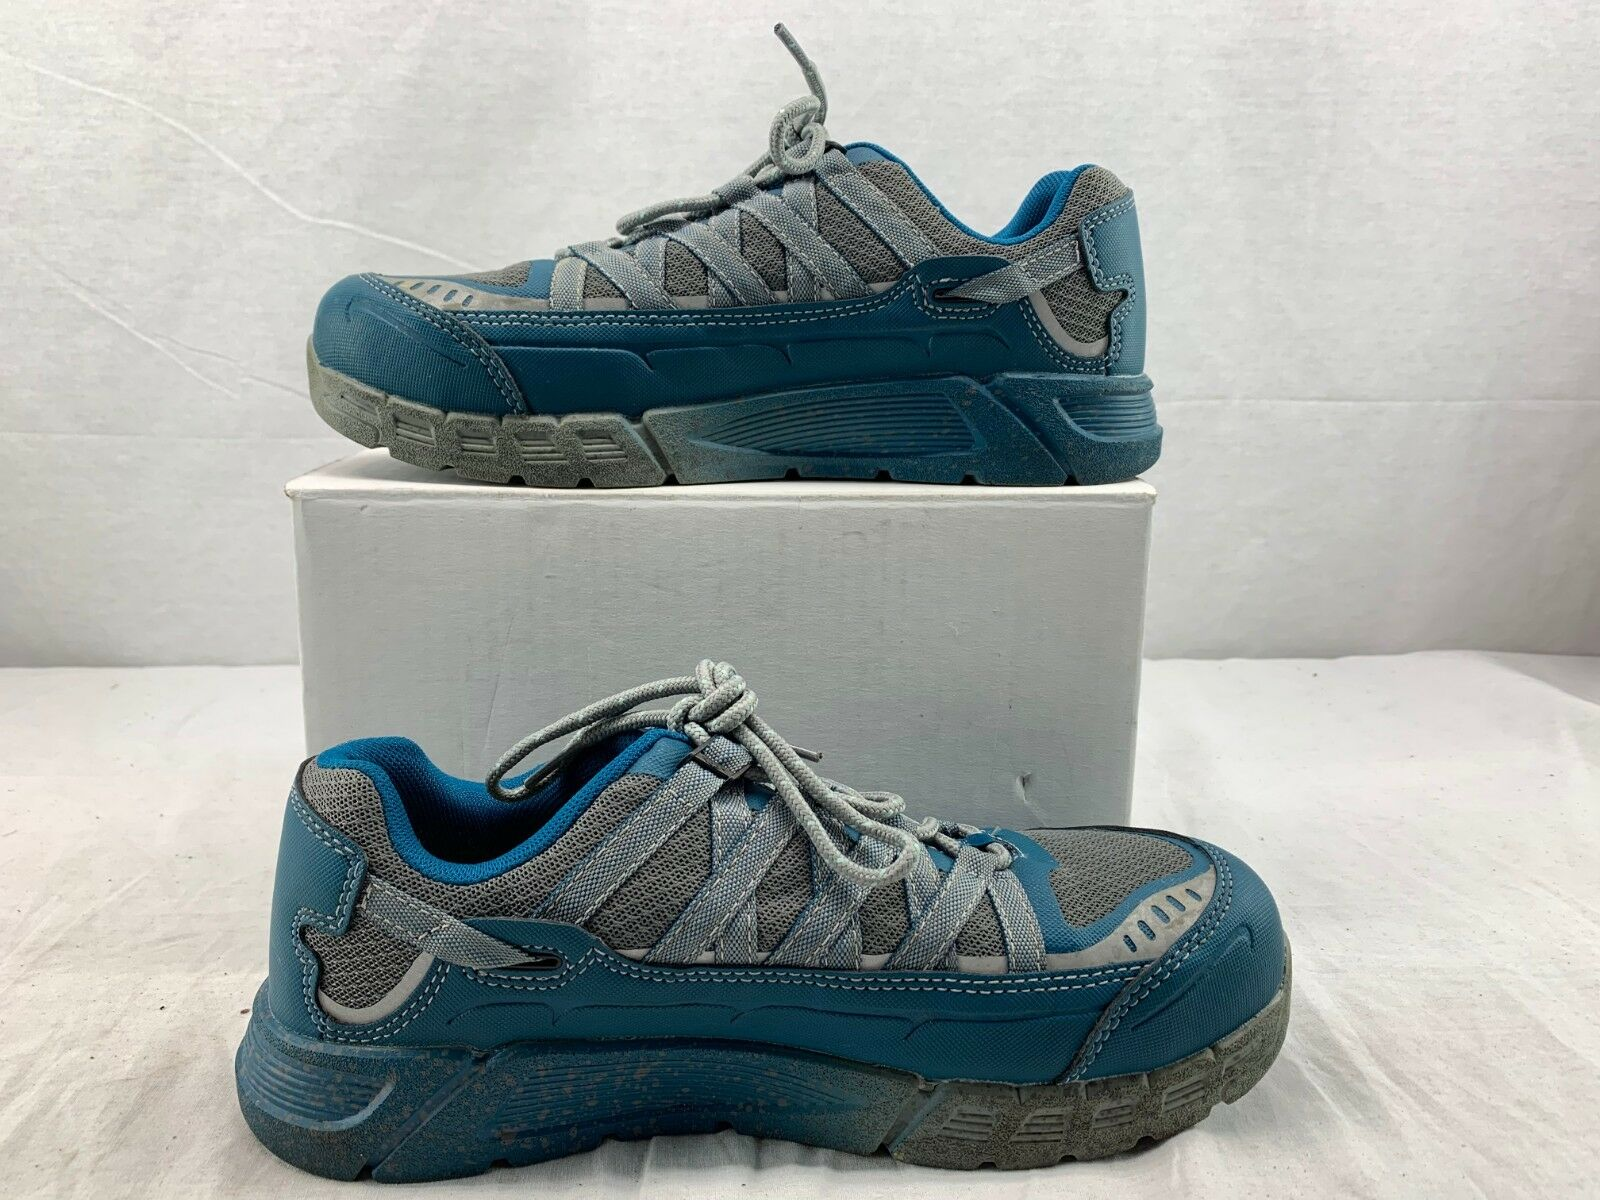 Keen Utility 1017074 Women's Aluminum Toe ESD Work shoes Ink bluee Eggshell 9.5 W